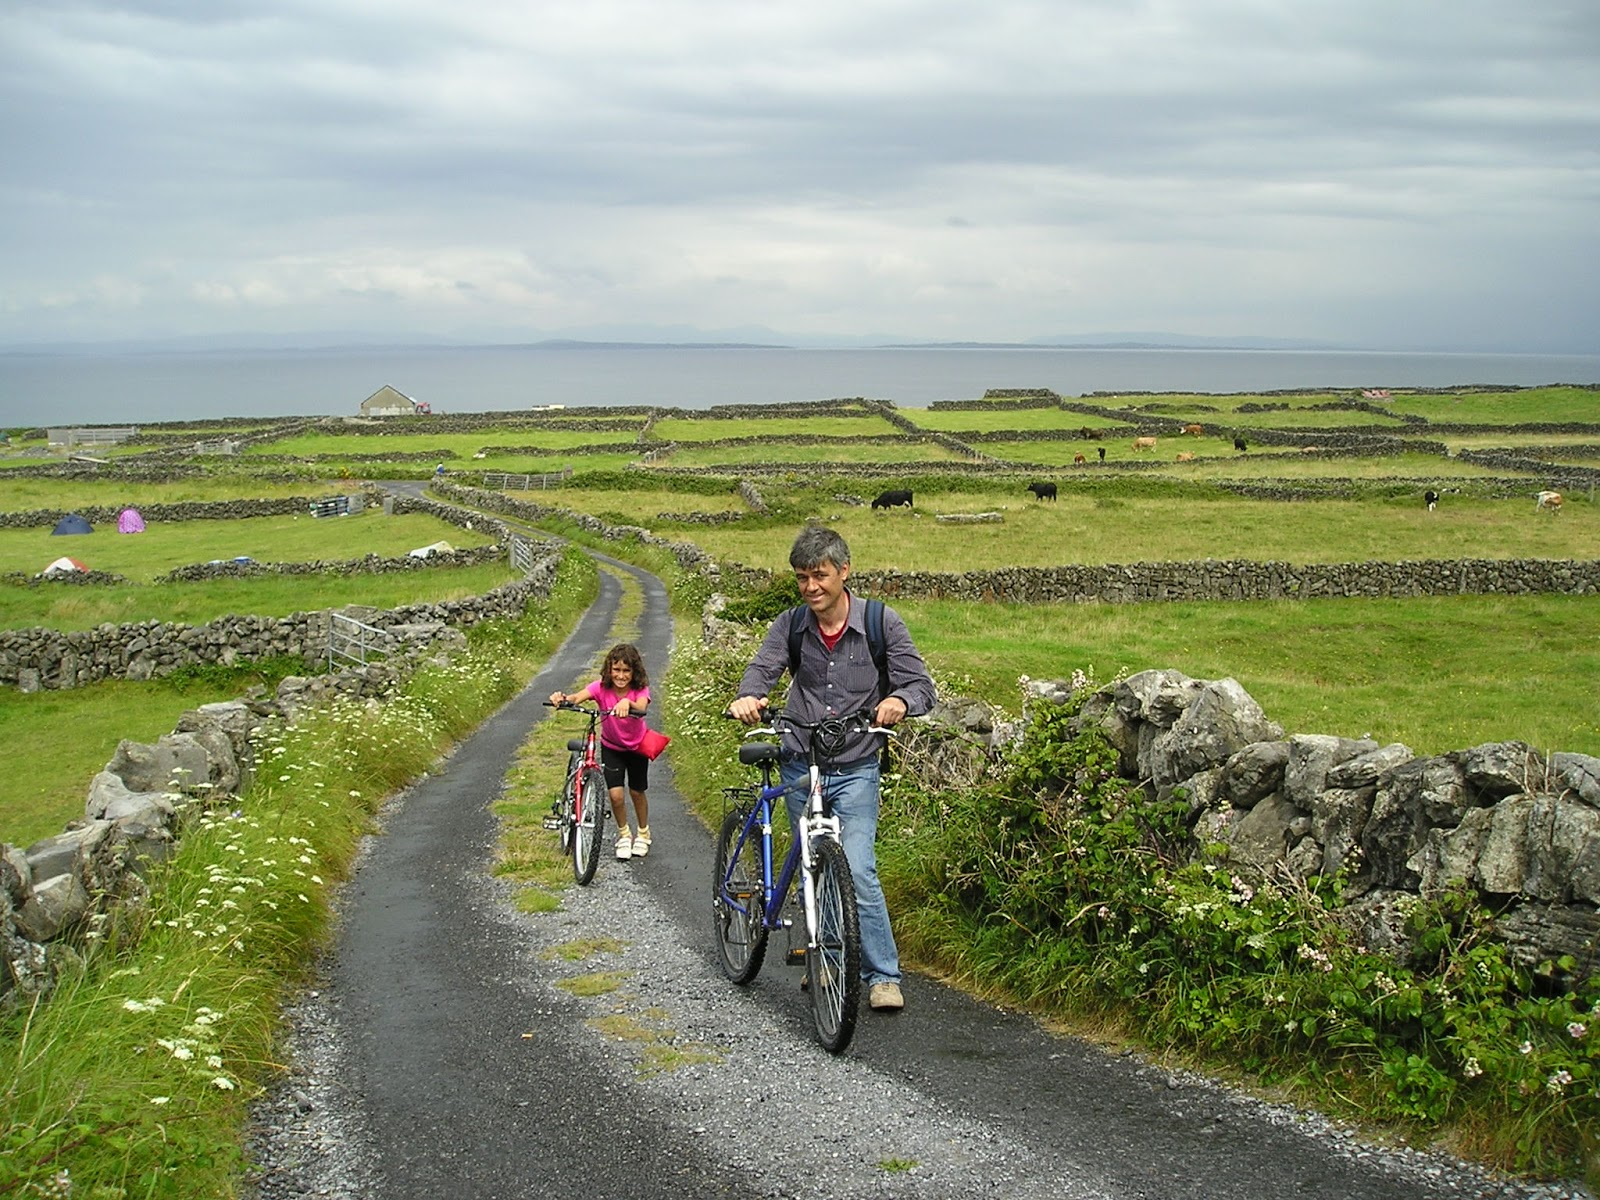 CARRETERA Y MANTA: Irlanda julio 2008